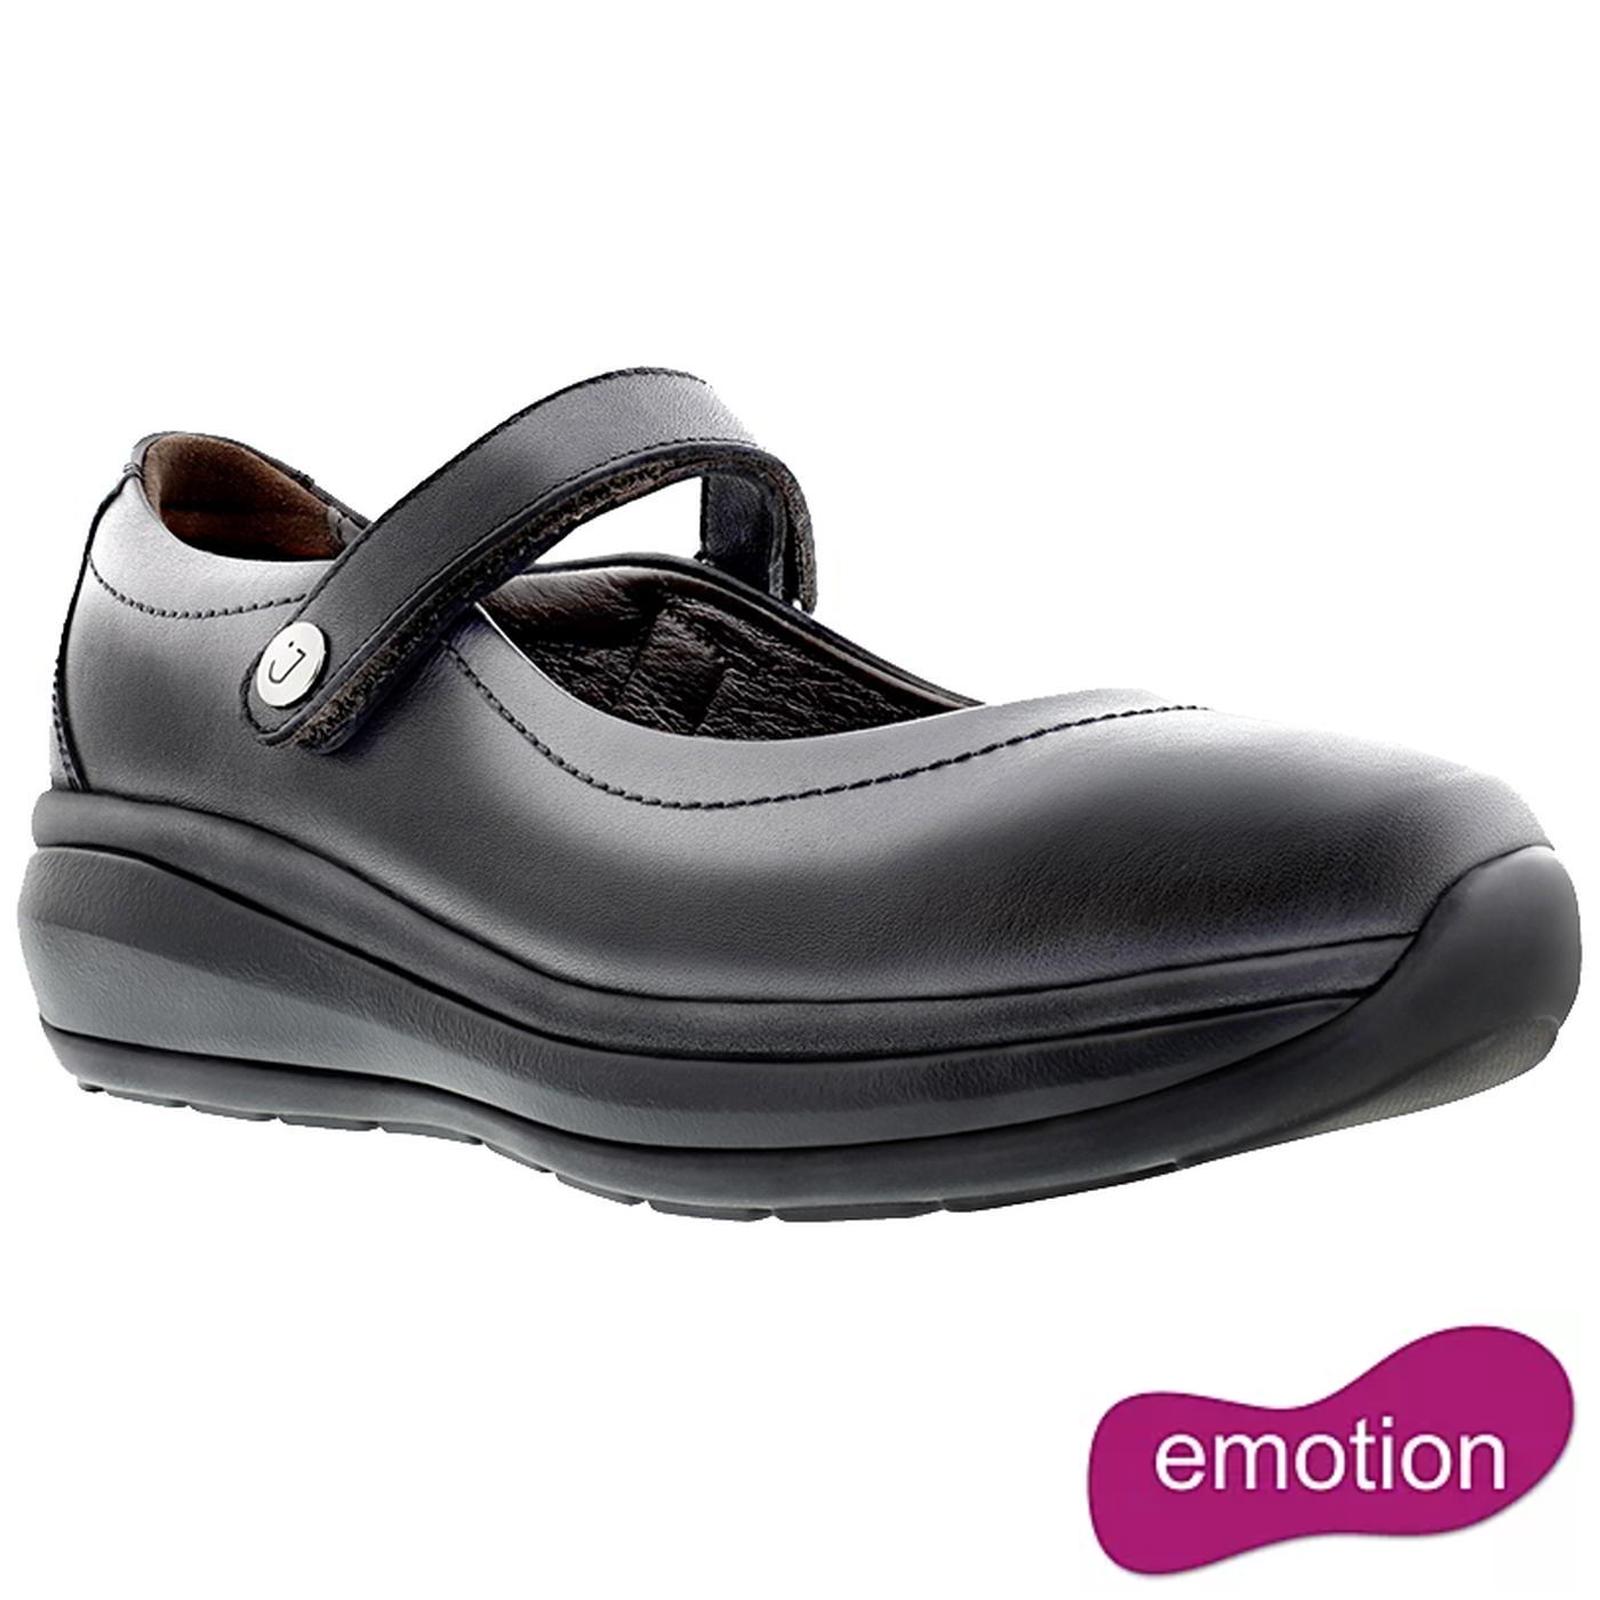 Joya Womens Mary Jane II Leather Shoes - Black